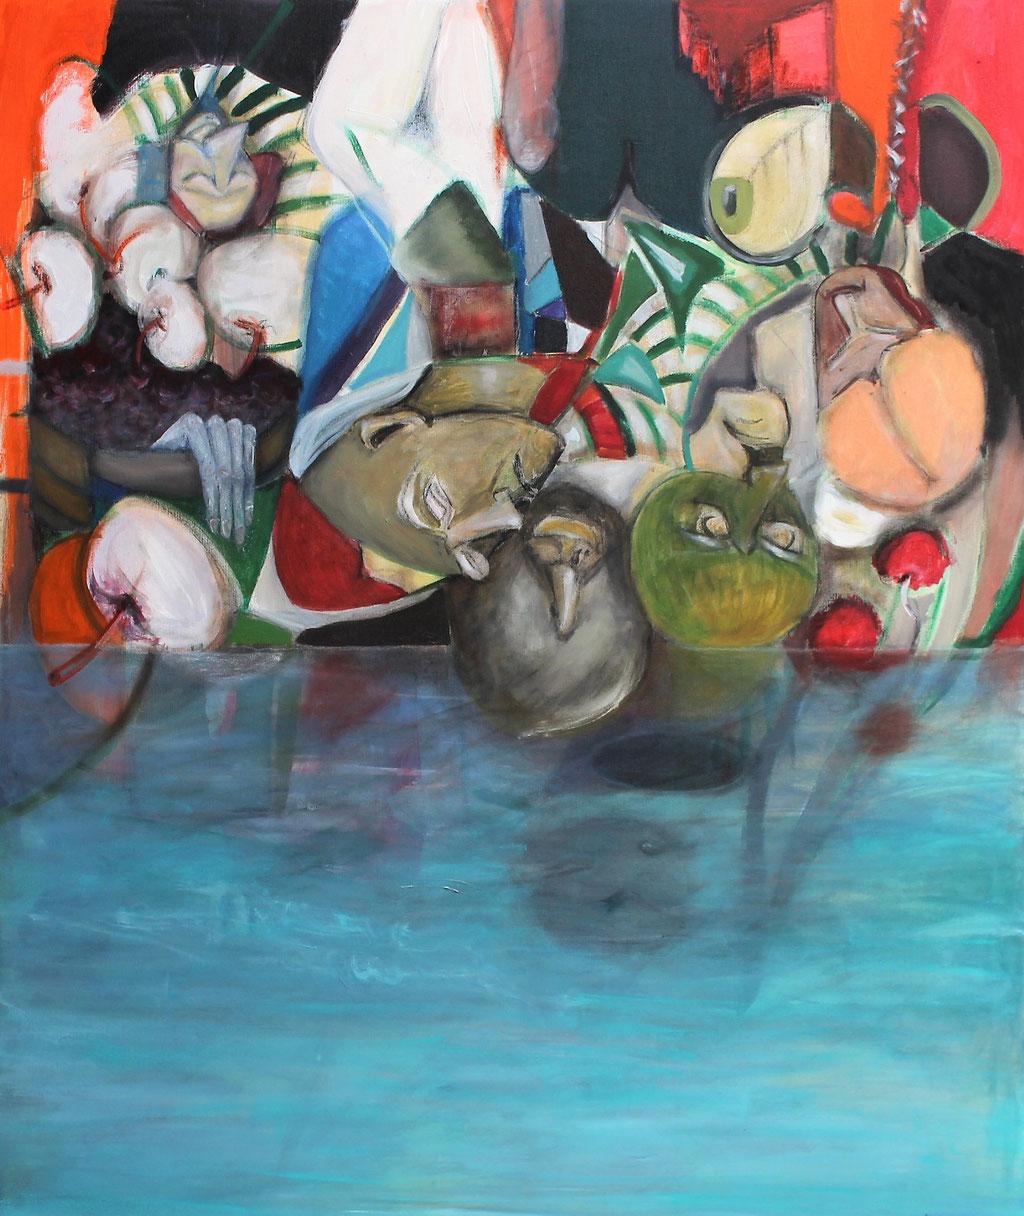 alltagswandel - 100 x 120 cm, Acryl auf Leinwand